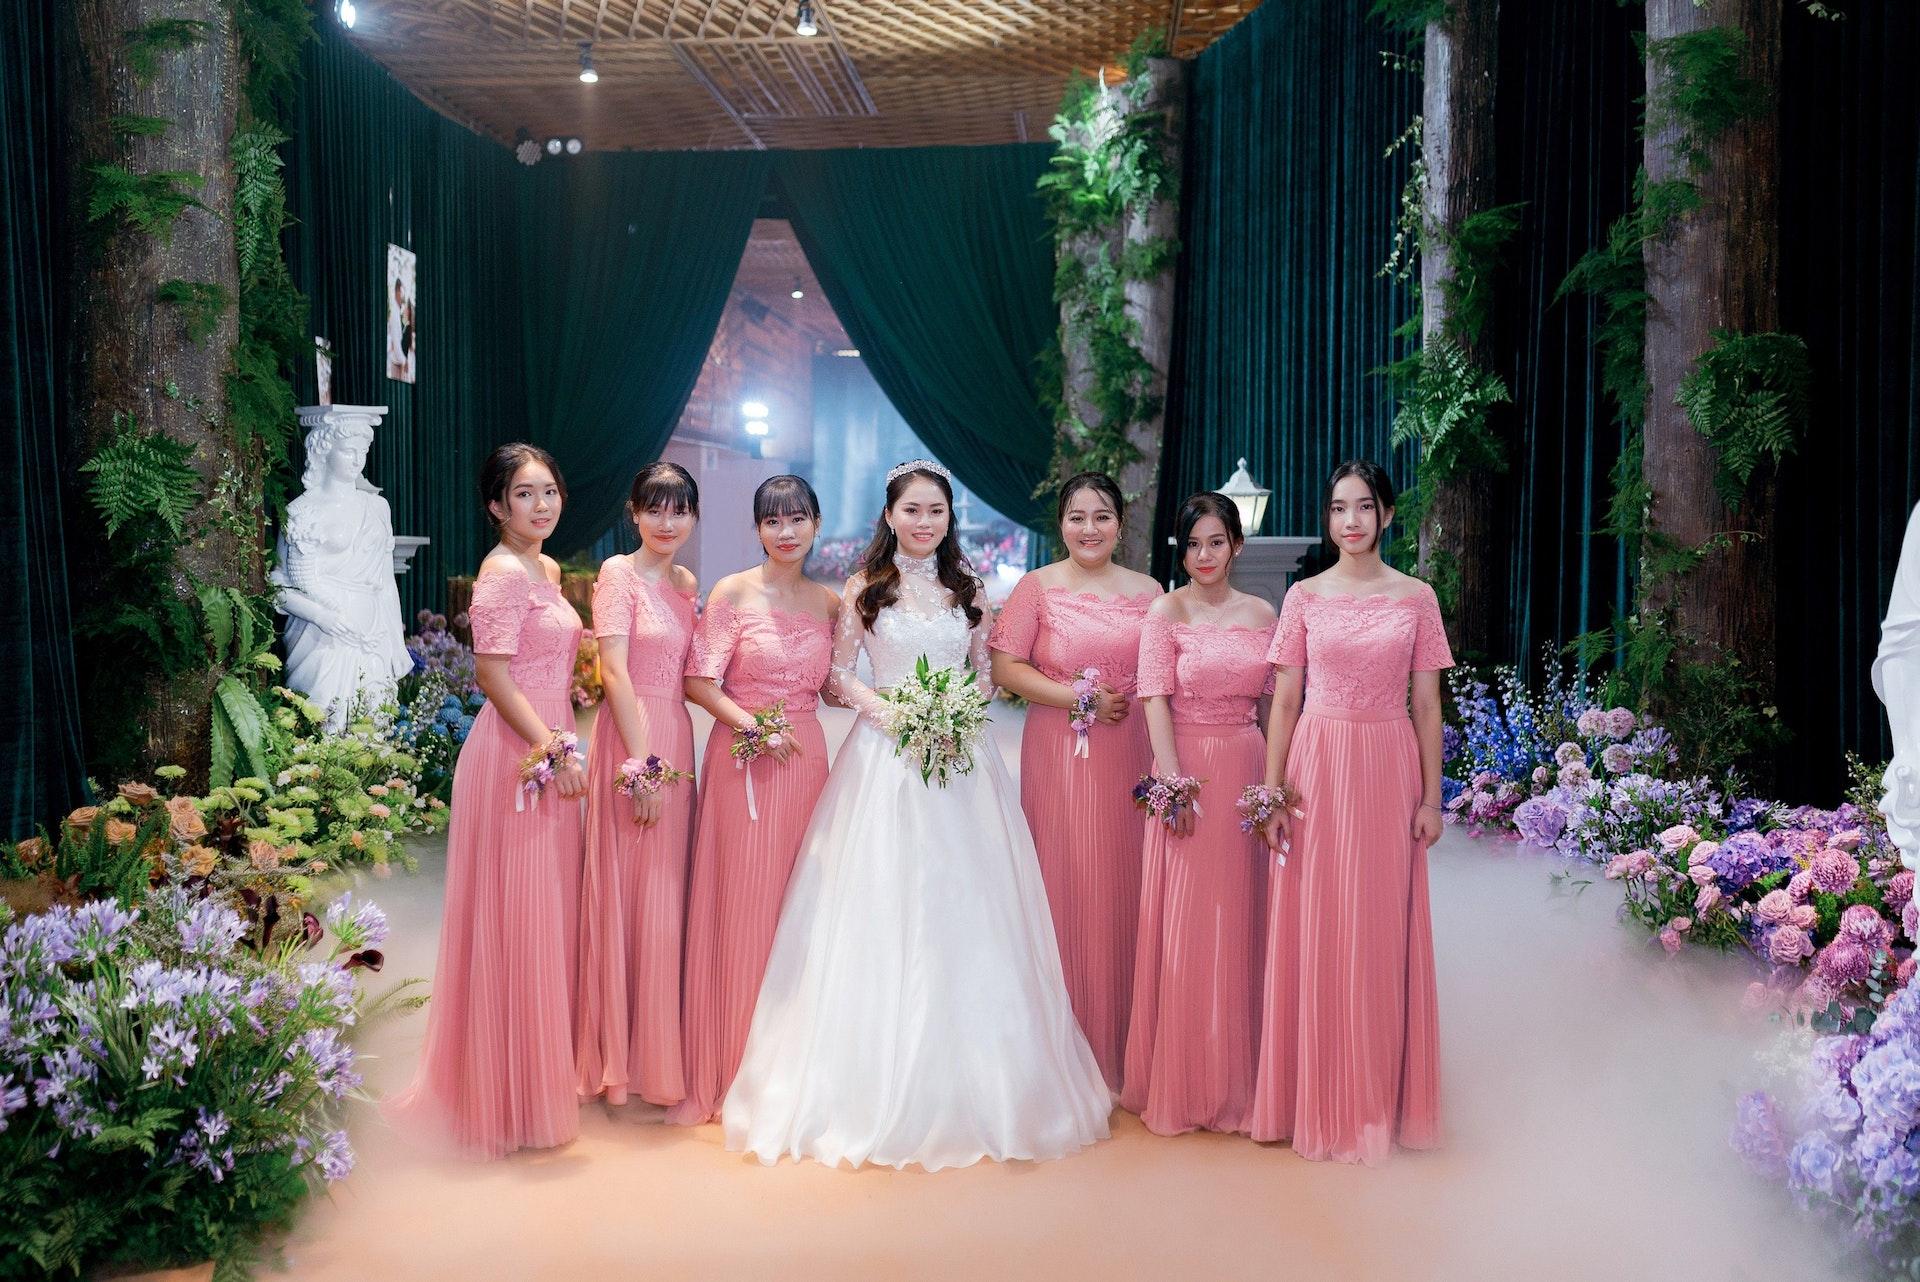 meraki wedding planners